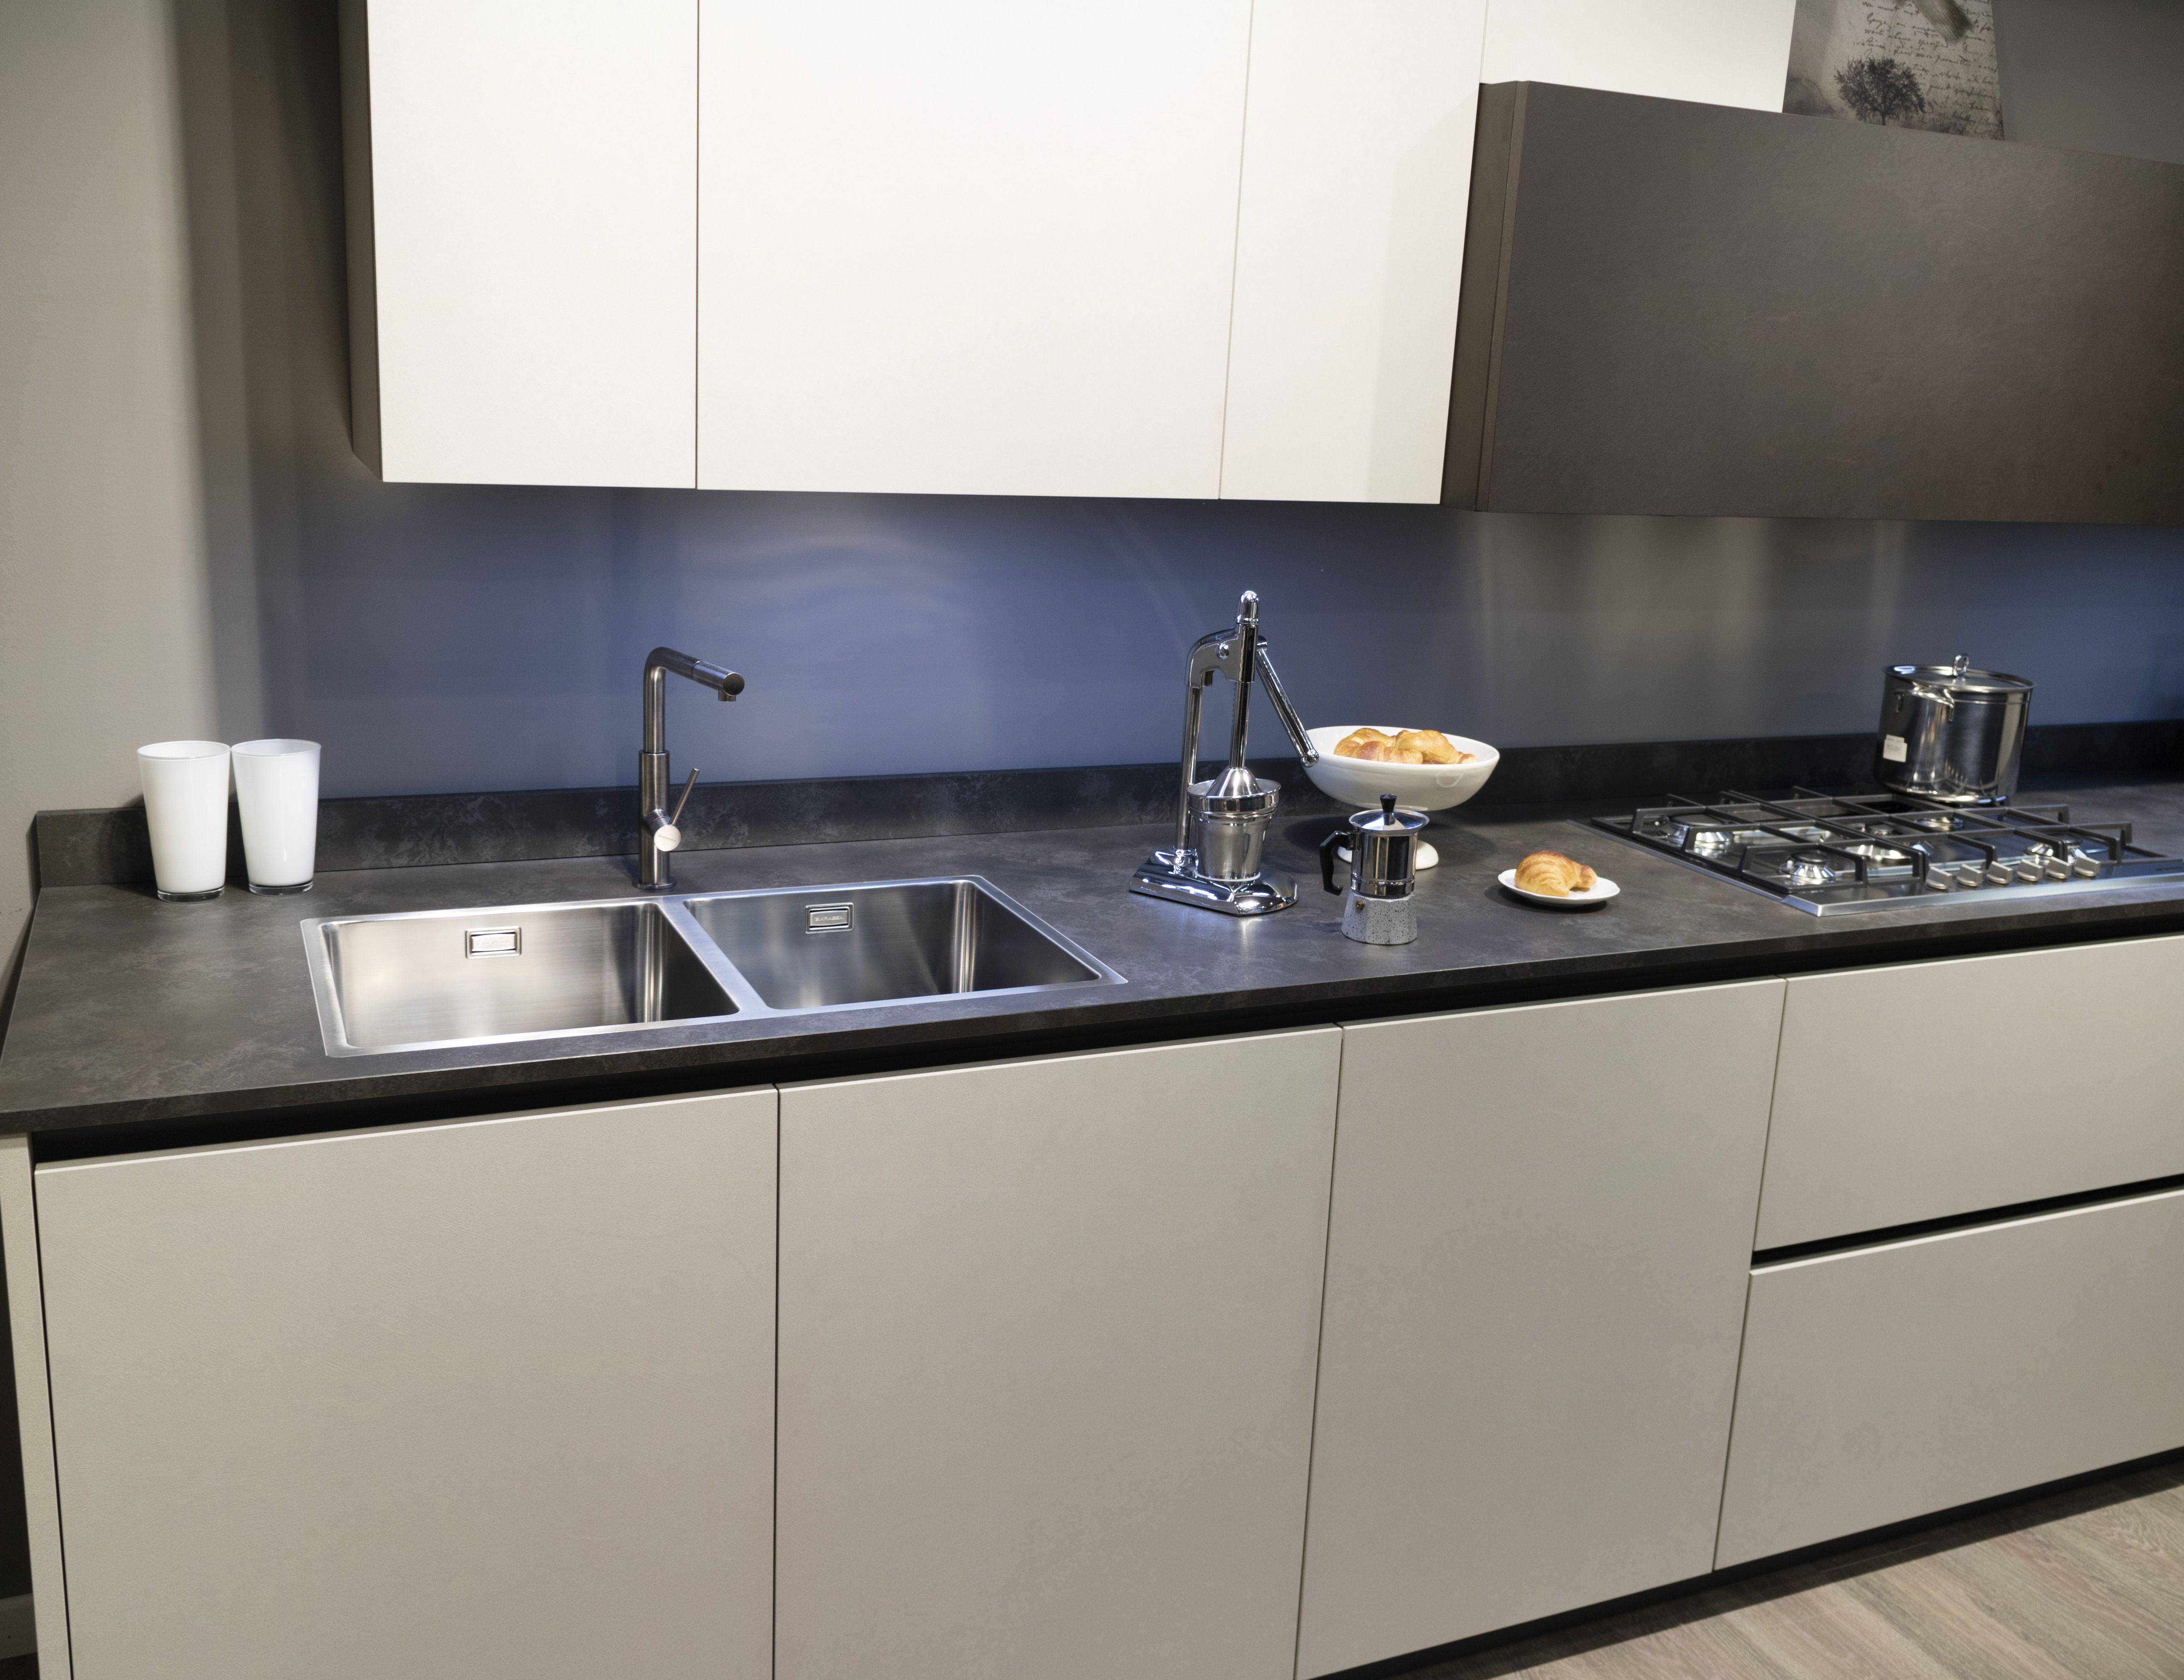 Cucina Bianca Top Nero Piastrelle.Cucina Design Moderno Arredamento Isola Italiana